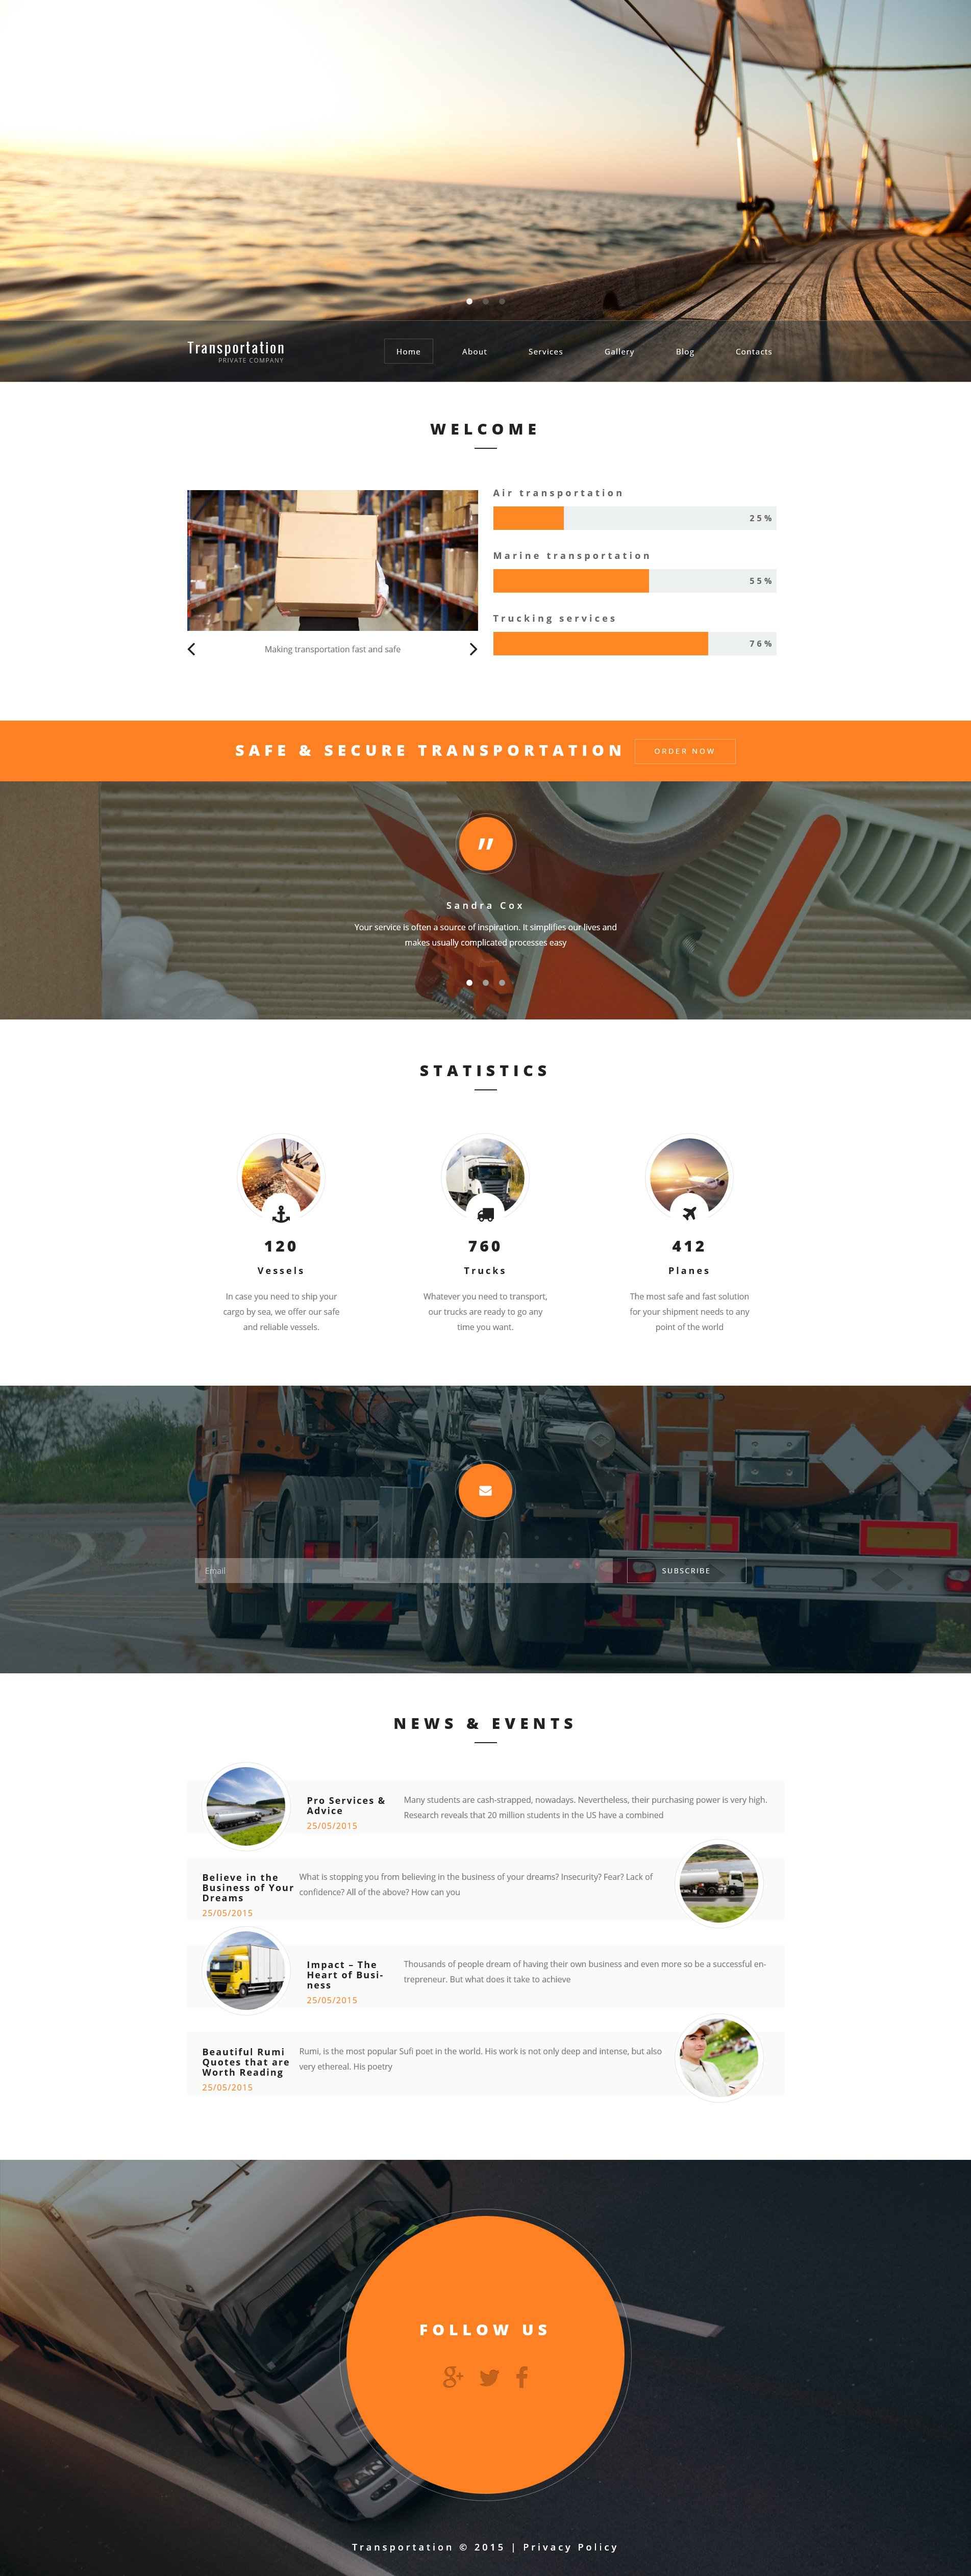 Transportation Private Company WordPress Theme - screenshot